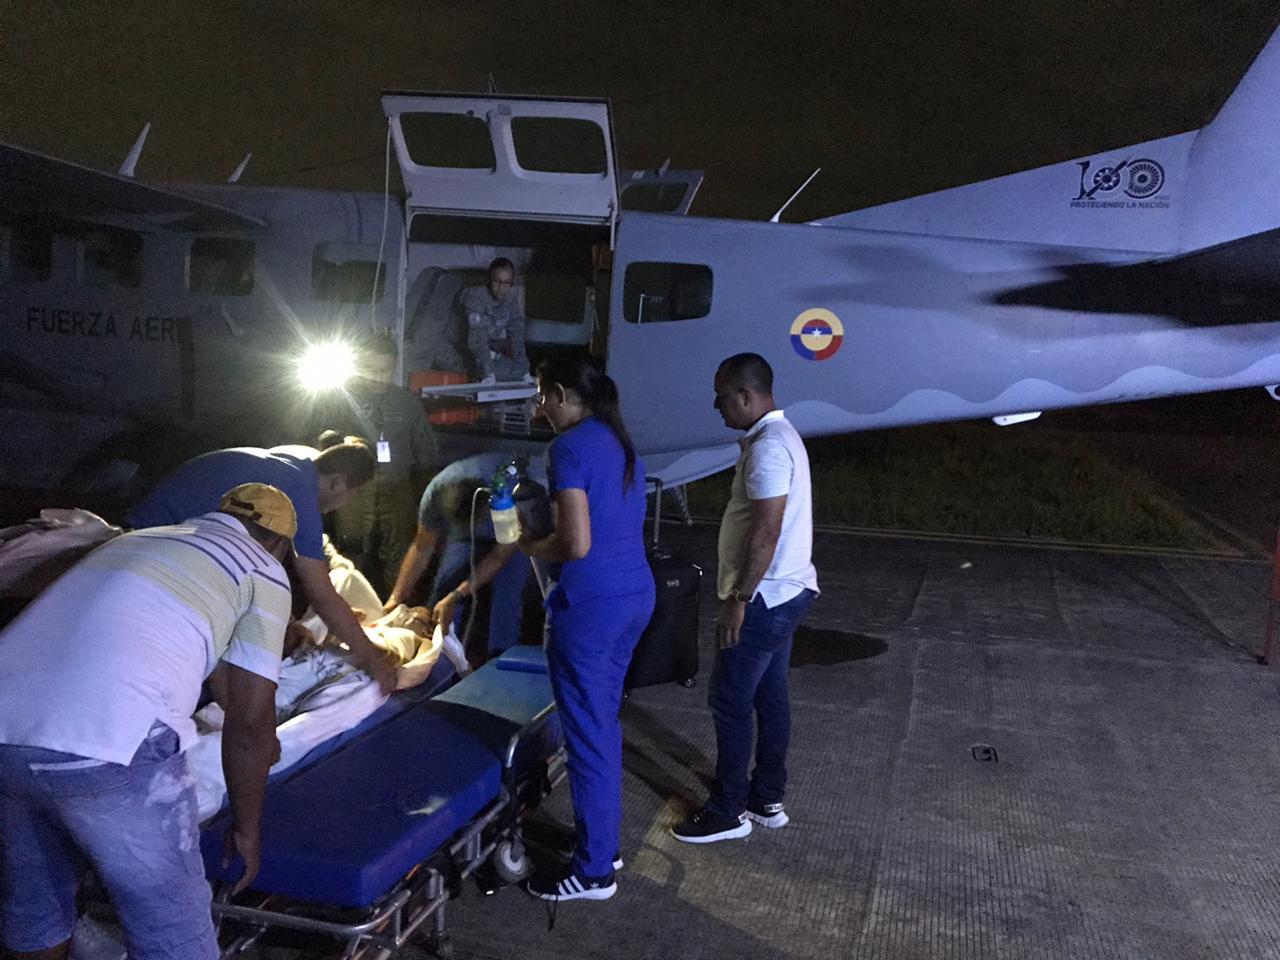 La Fuerza Aérea salva la vida de un niño